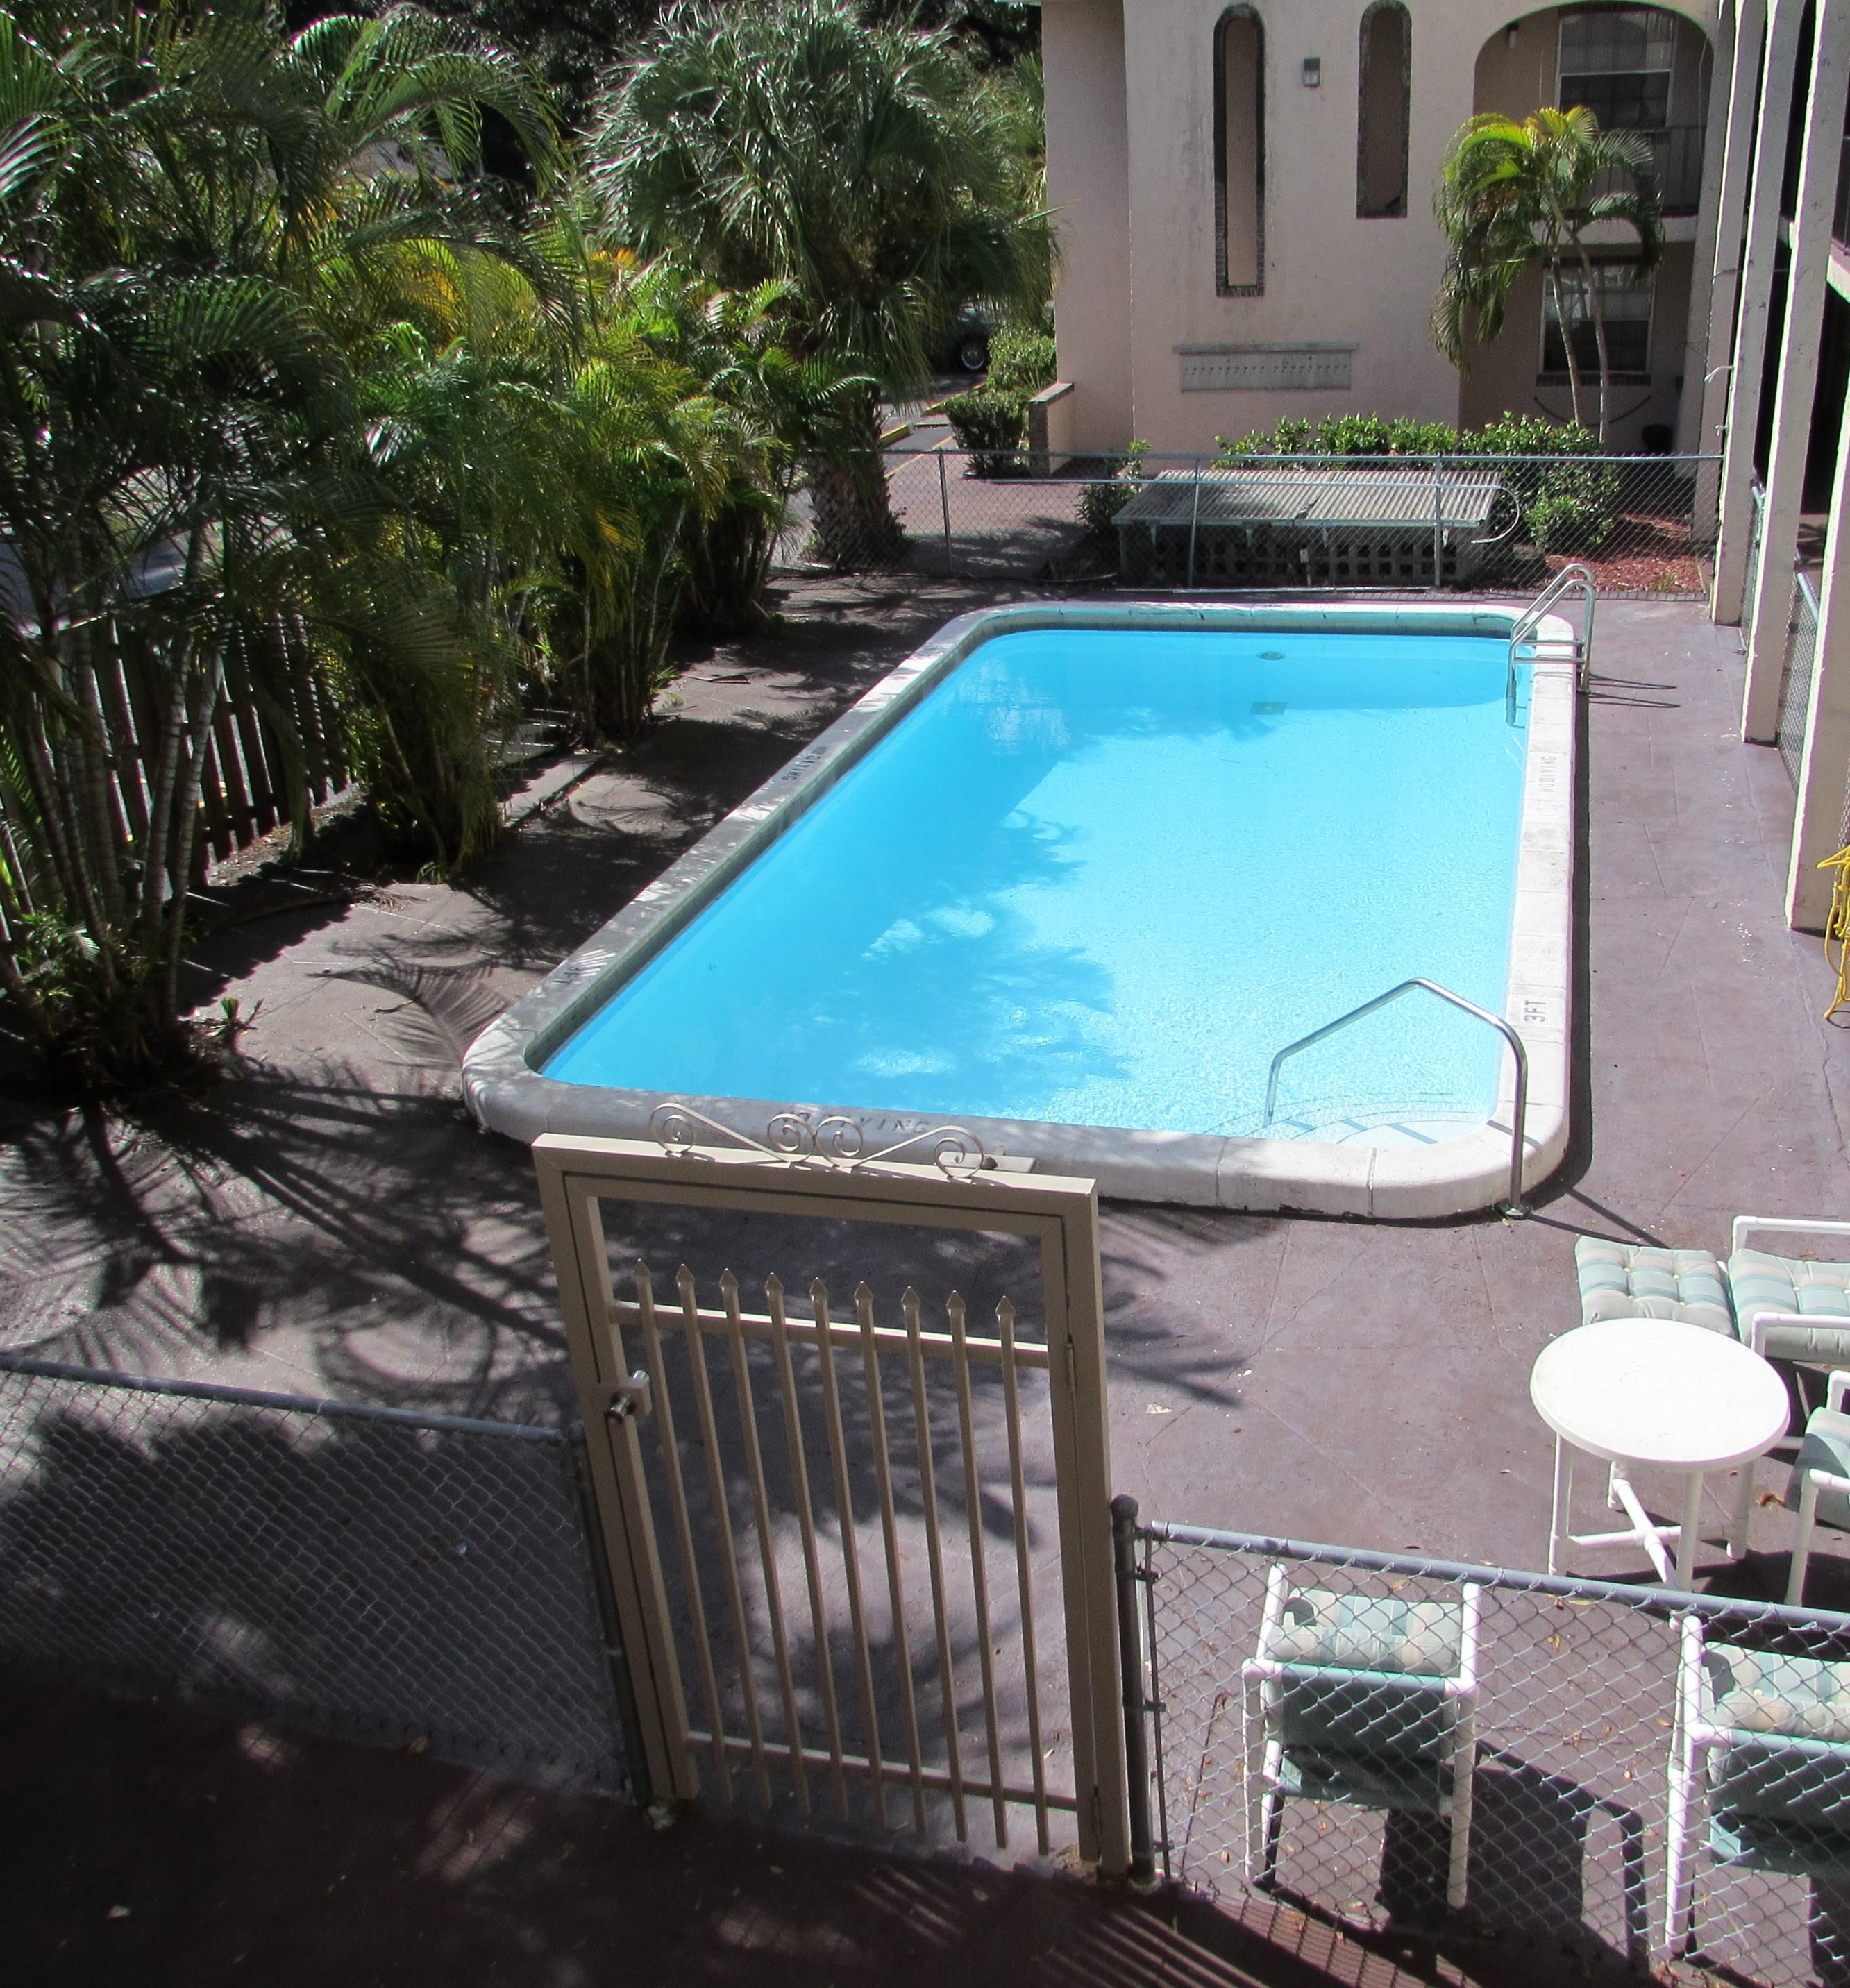 Spanish Oaks, Ft. Lauderdale Property Management, Spanish